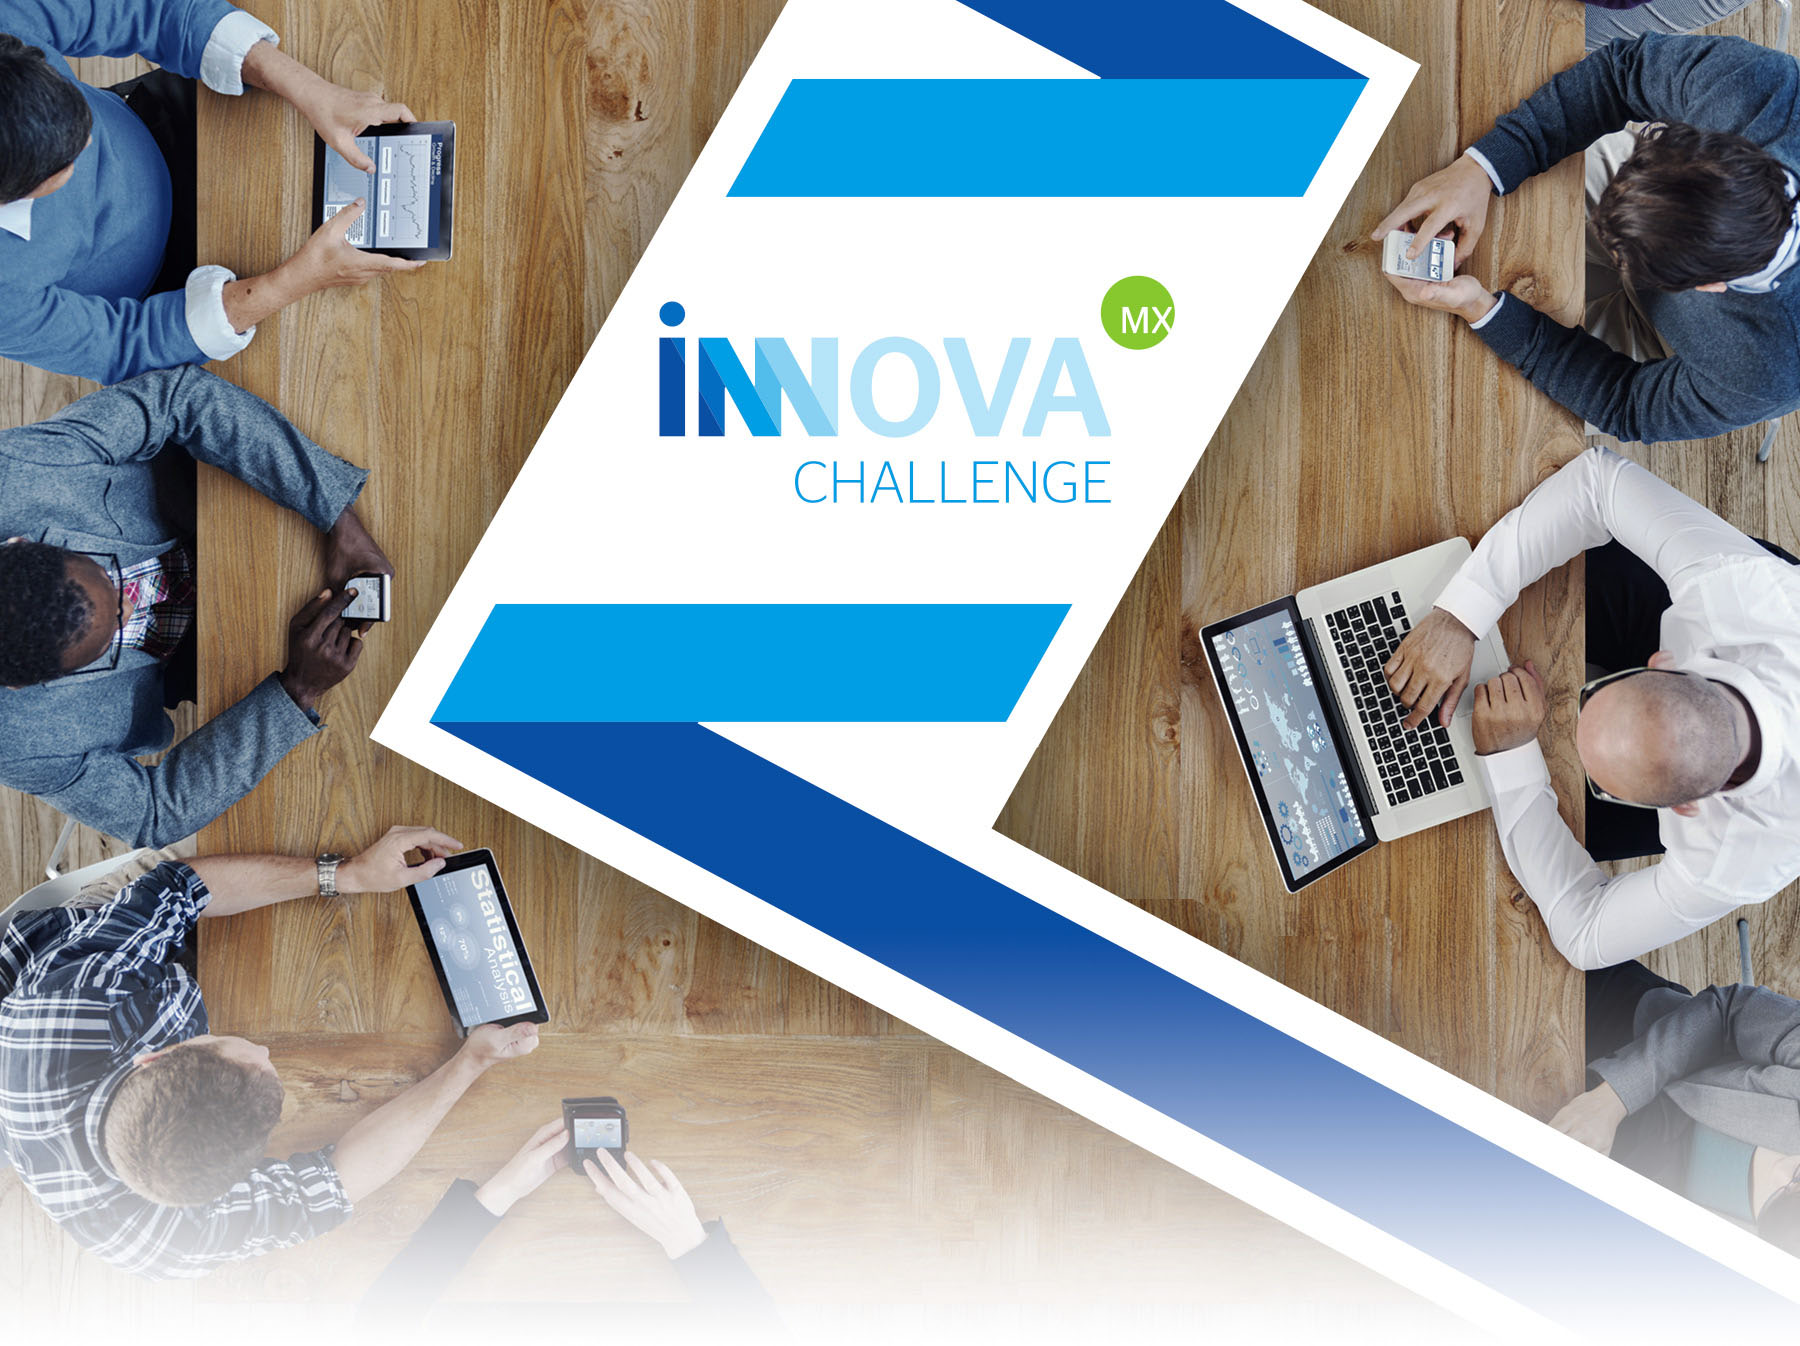 InnovaChallenge MX in San Francisco: Geospatial analysis of financial data